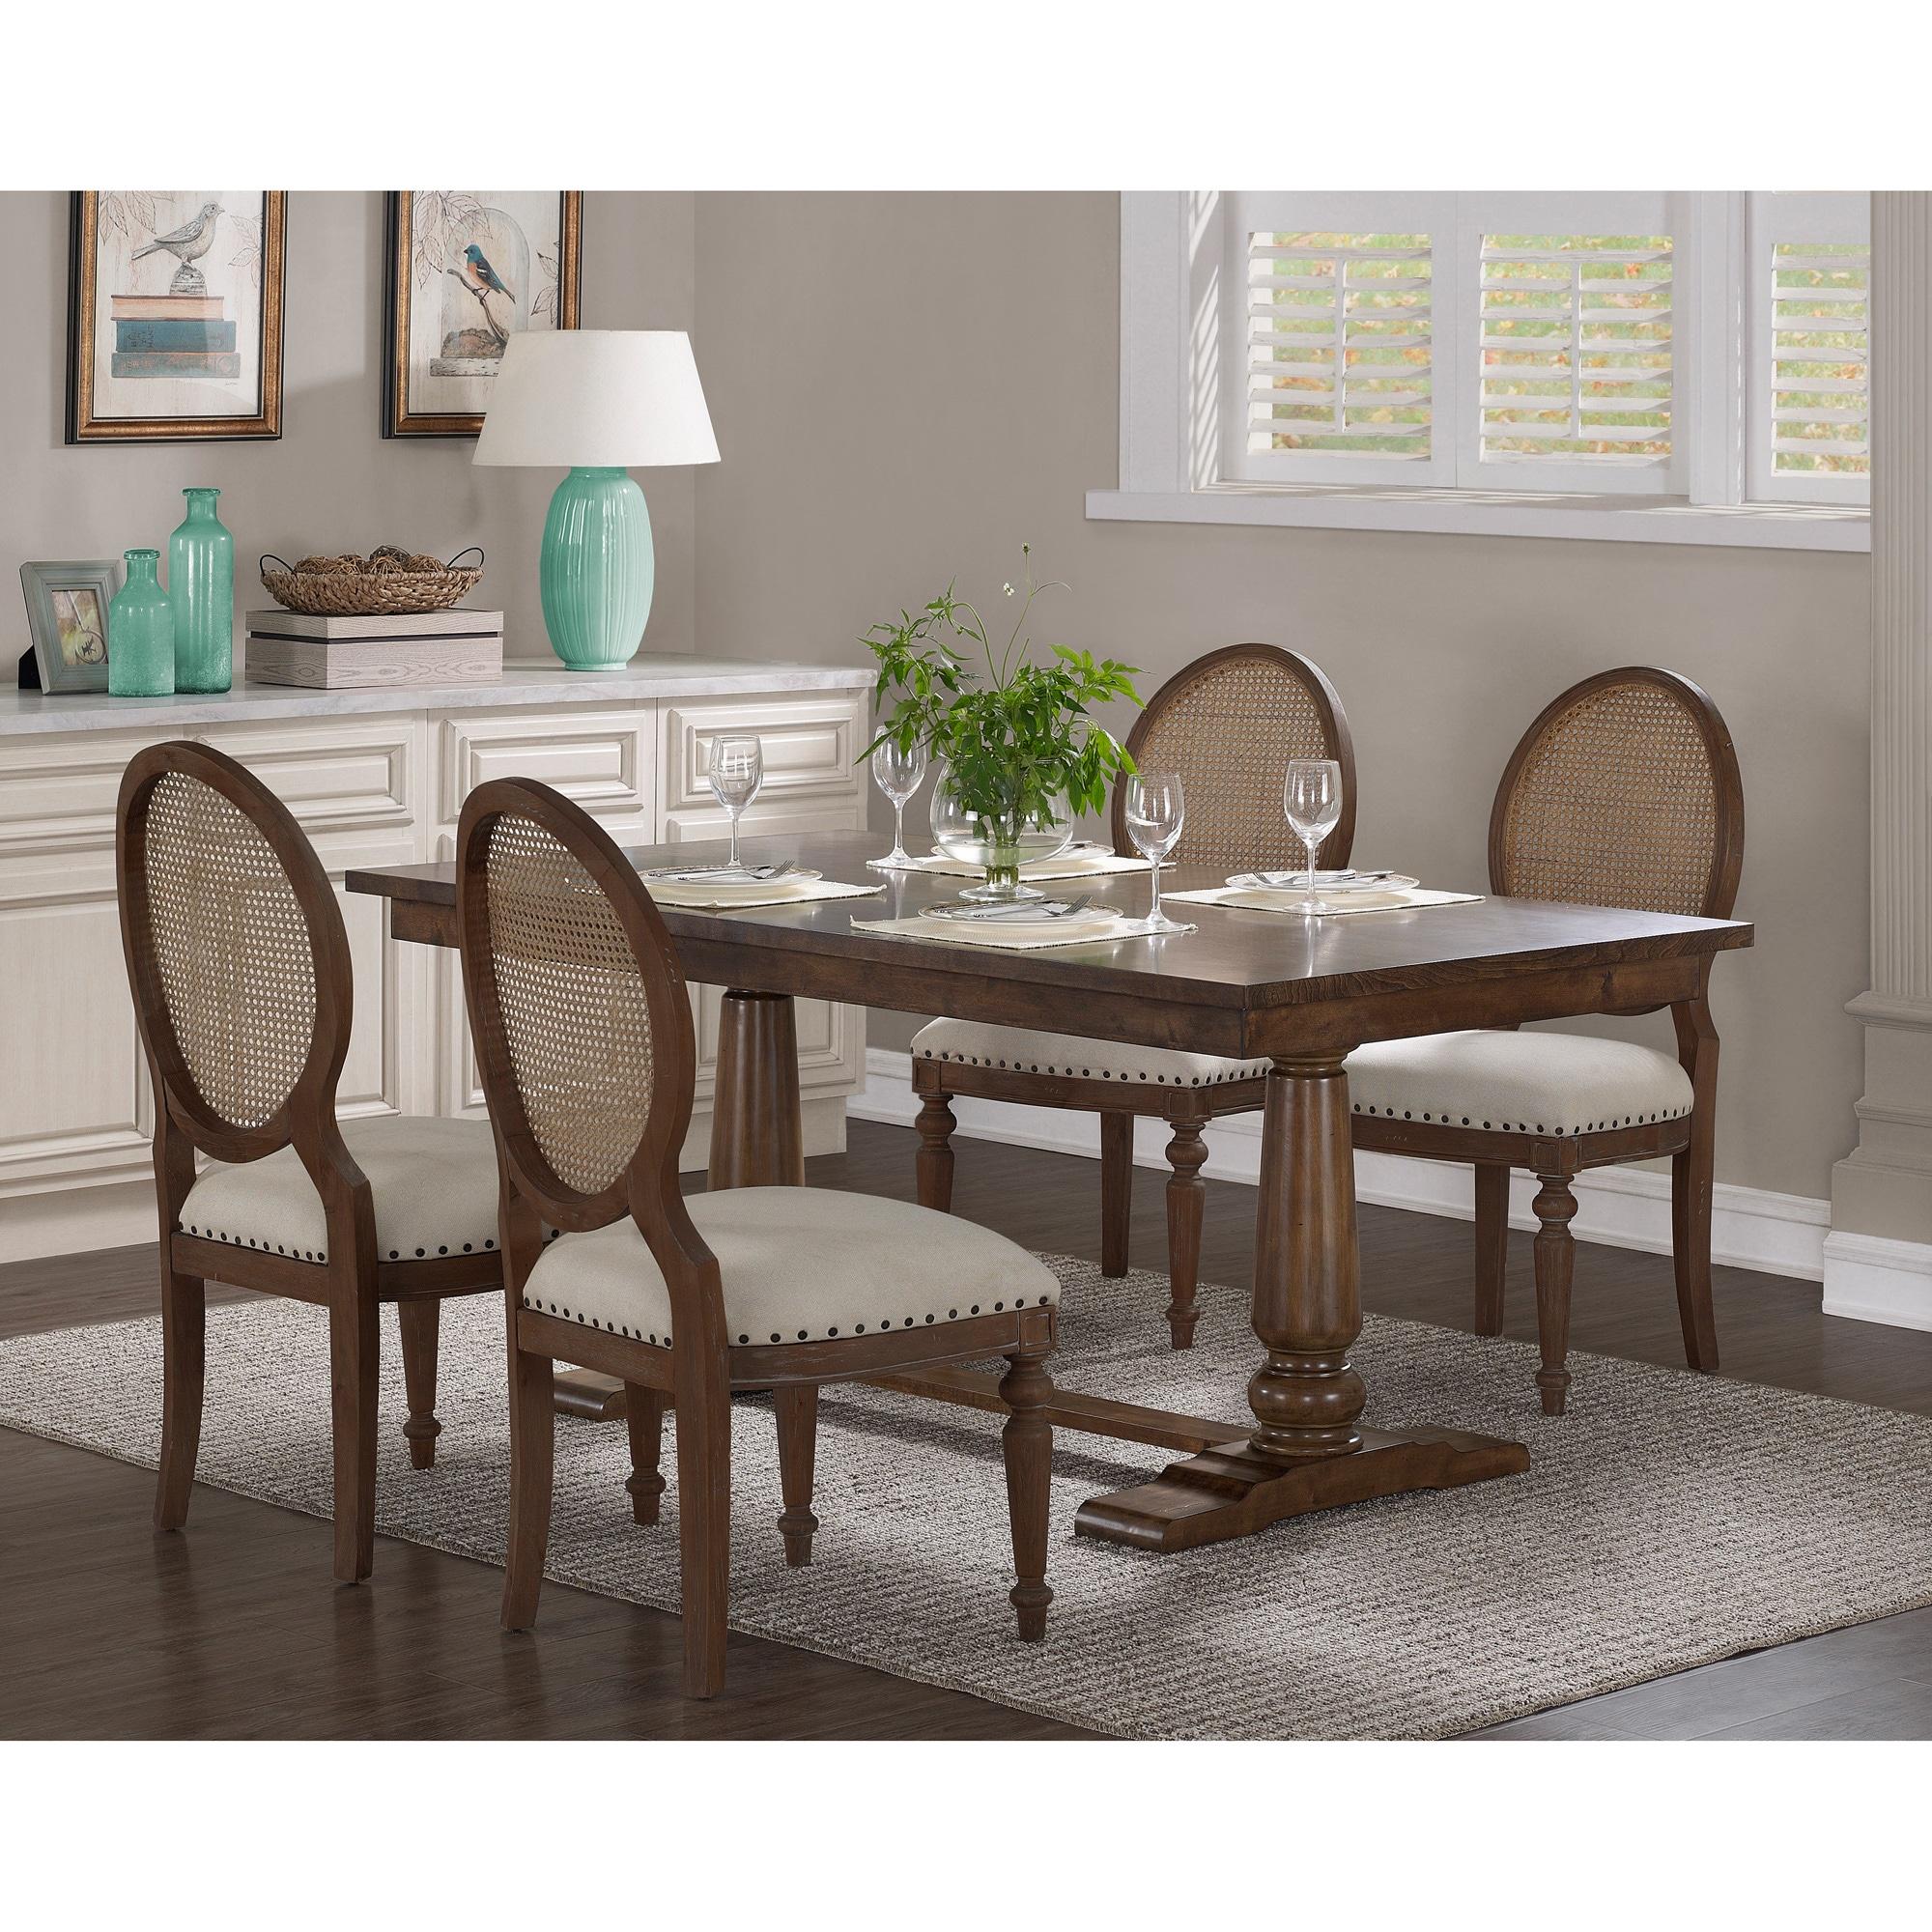 The Gray Barn Farmhouse Oak Pedestal Dining Table